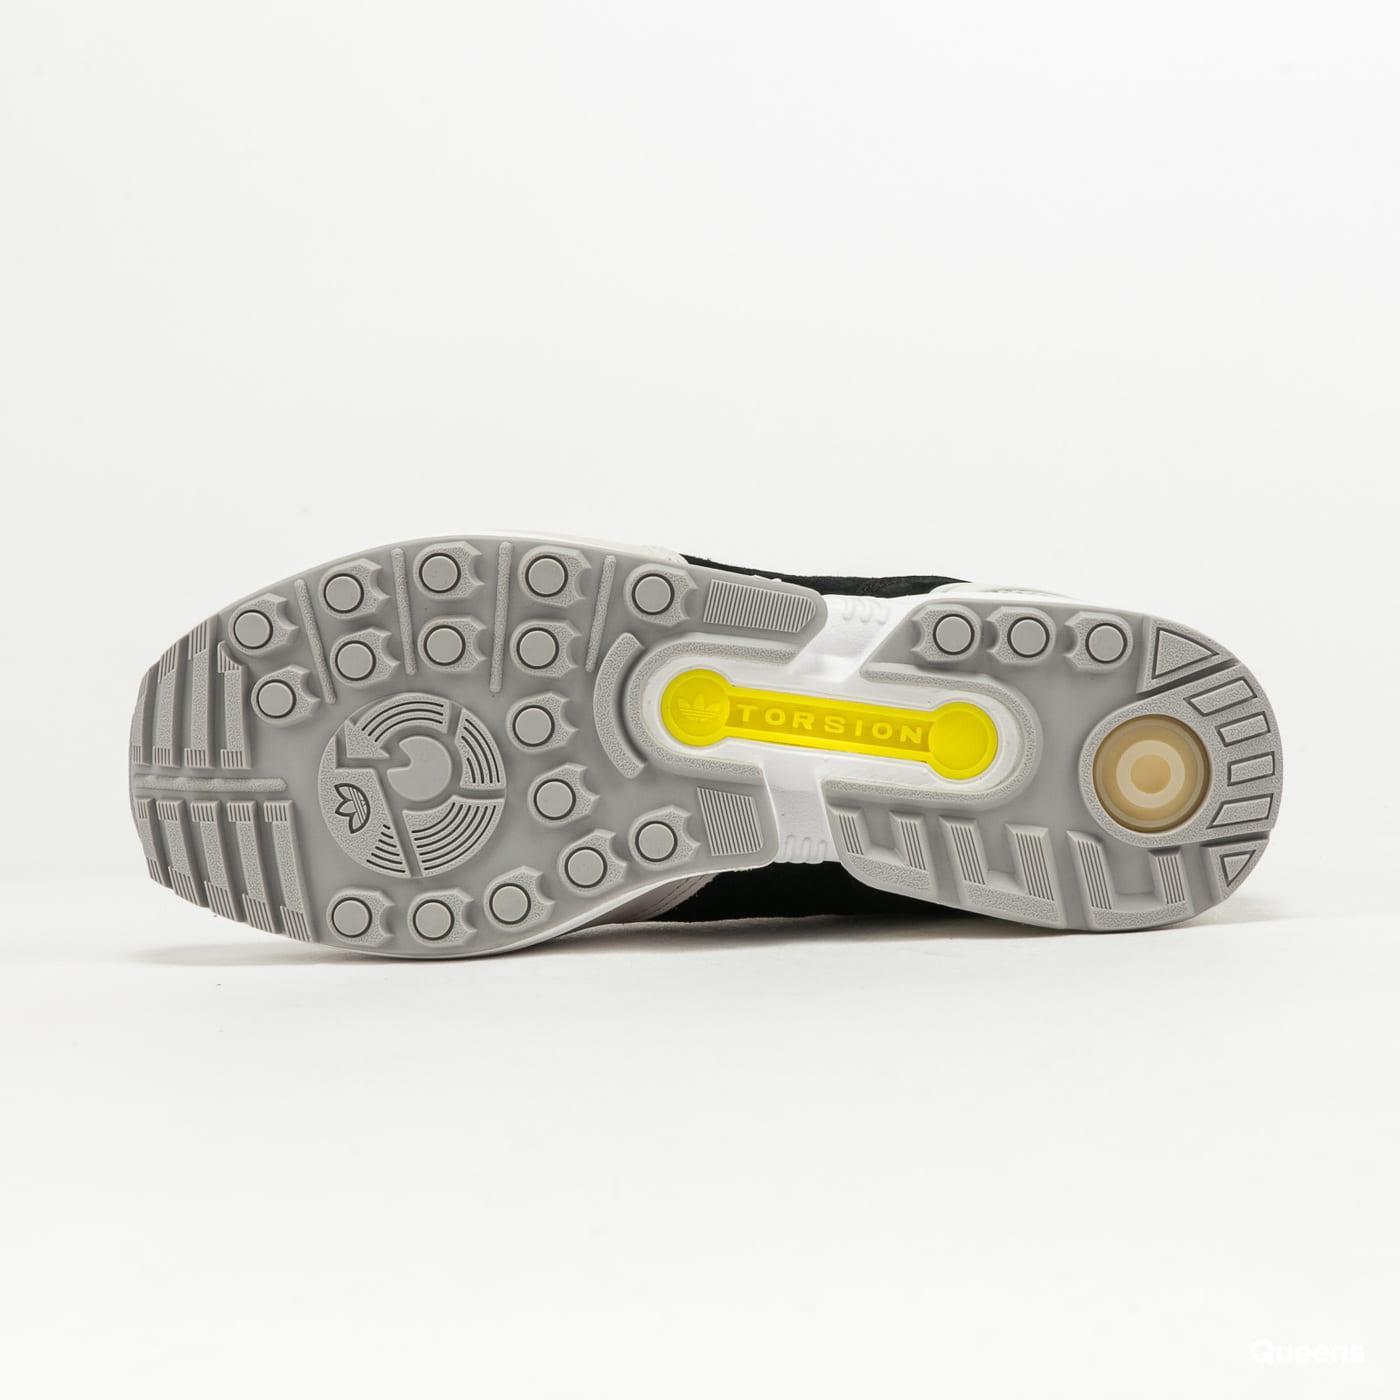 adidas Originals ZX 8000 crywht / cwhite / cblack